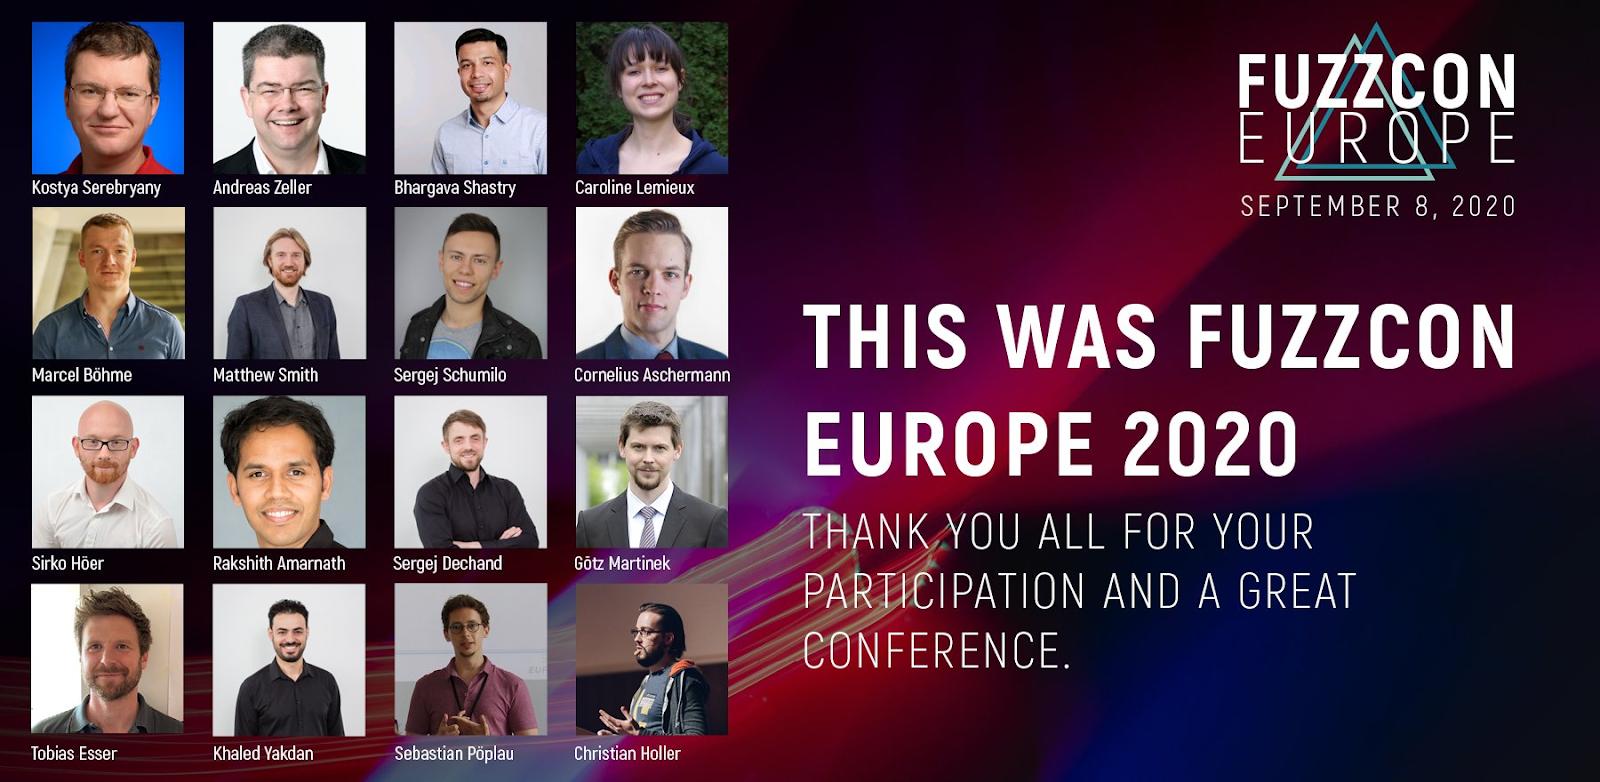 FuzzCon Europe - Kostya Serebryany, Marcel Böhme, Christian Holler, etc.